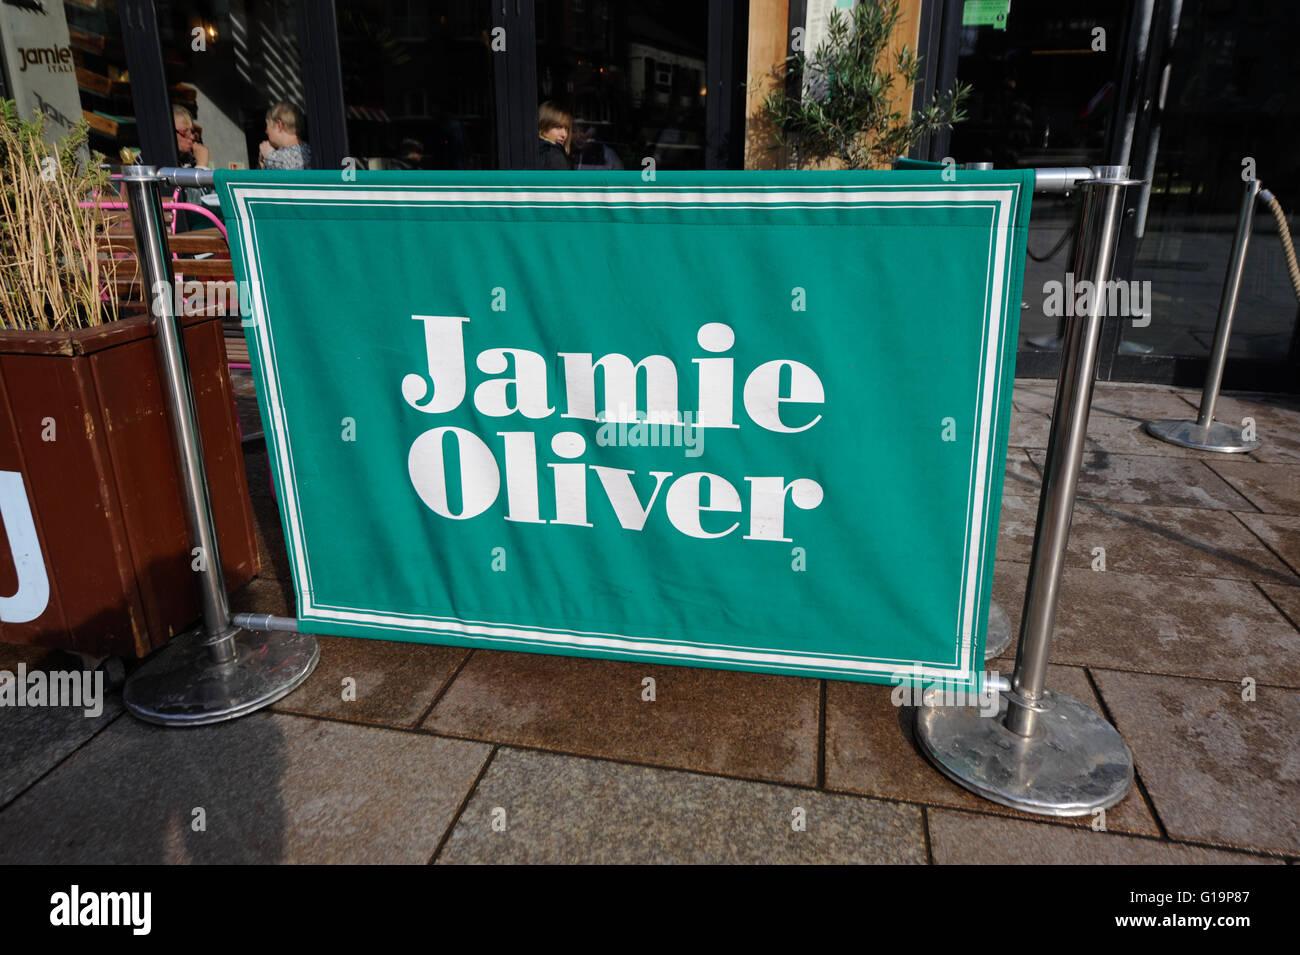 Jamie Oliver restaurant - Cardiff, United Kingdom - Stock Image